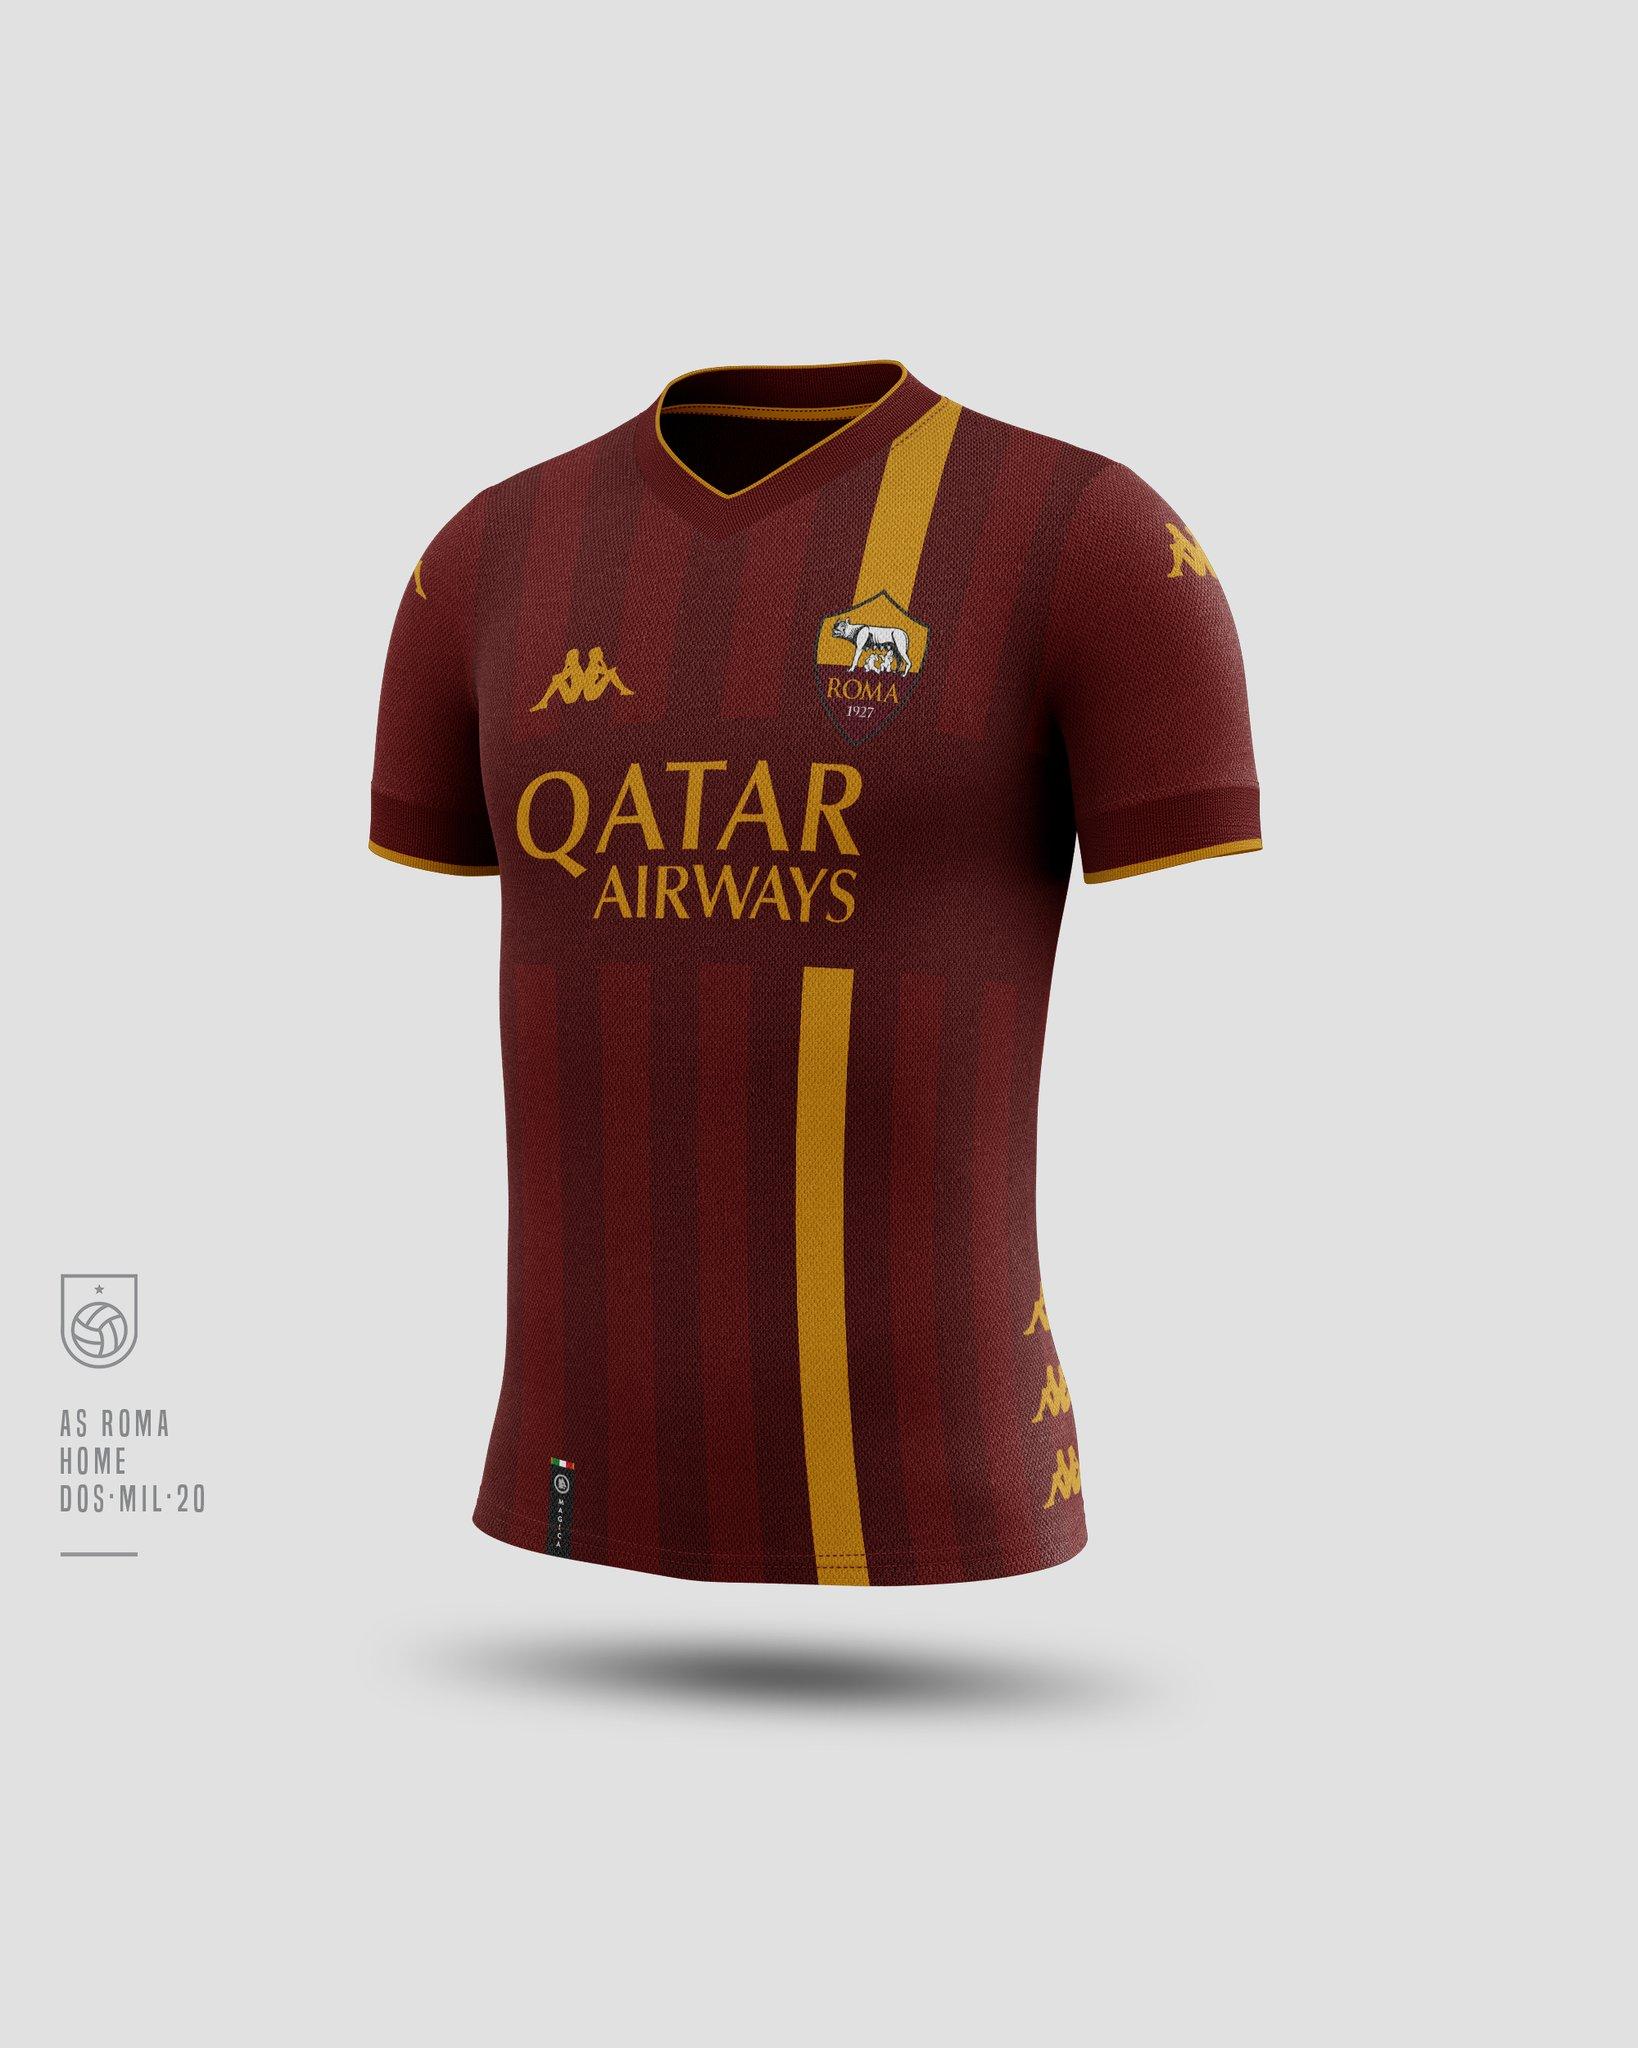 concept kit maglie as roma 2022 – fashionleague 1